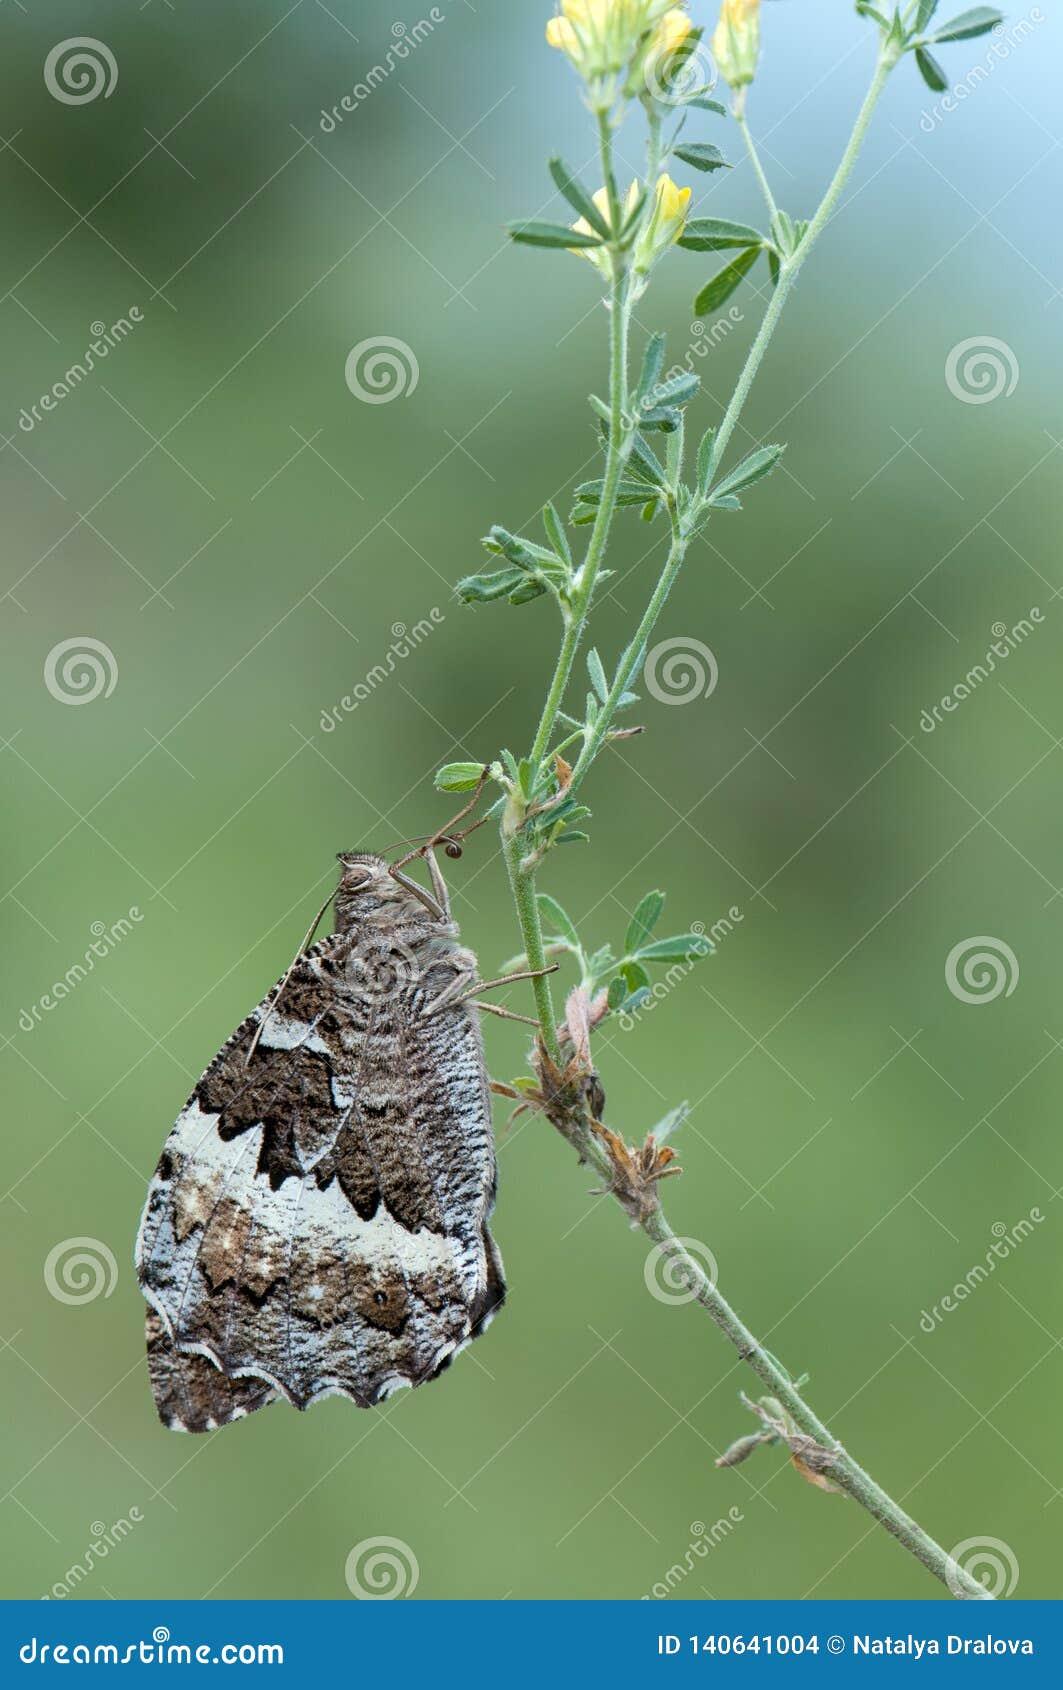 大蝴蝶Laminitis populi